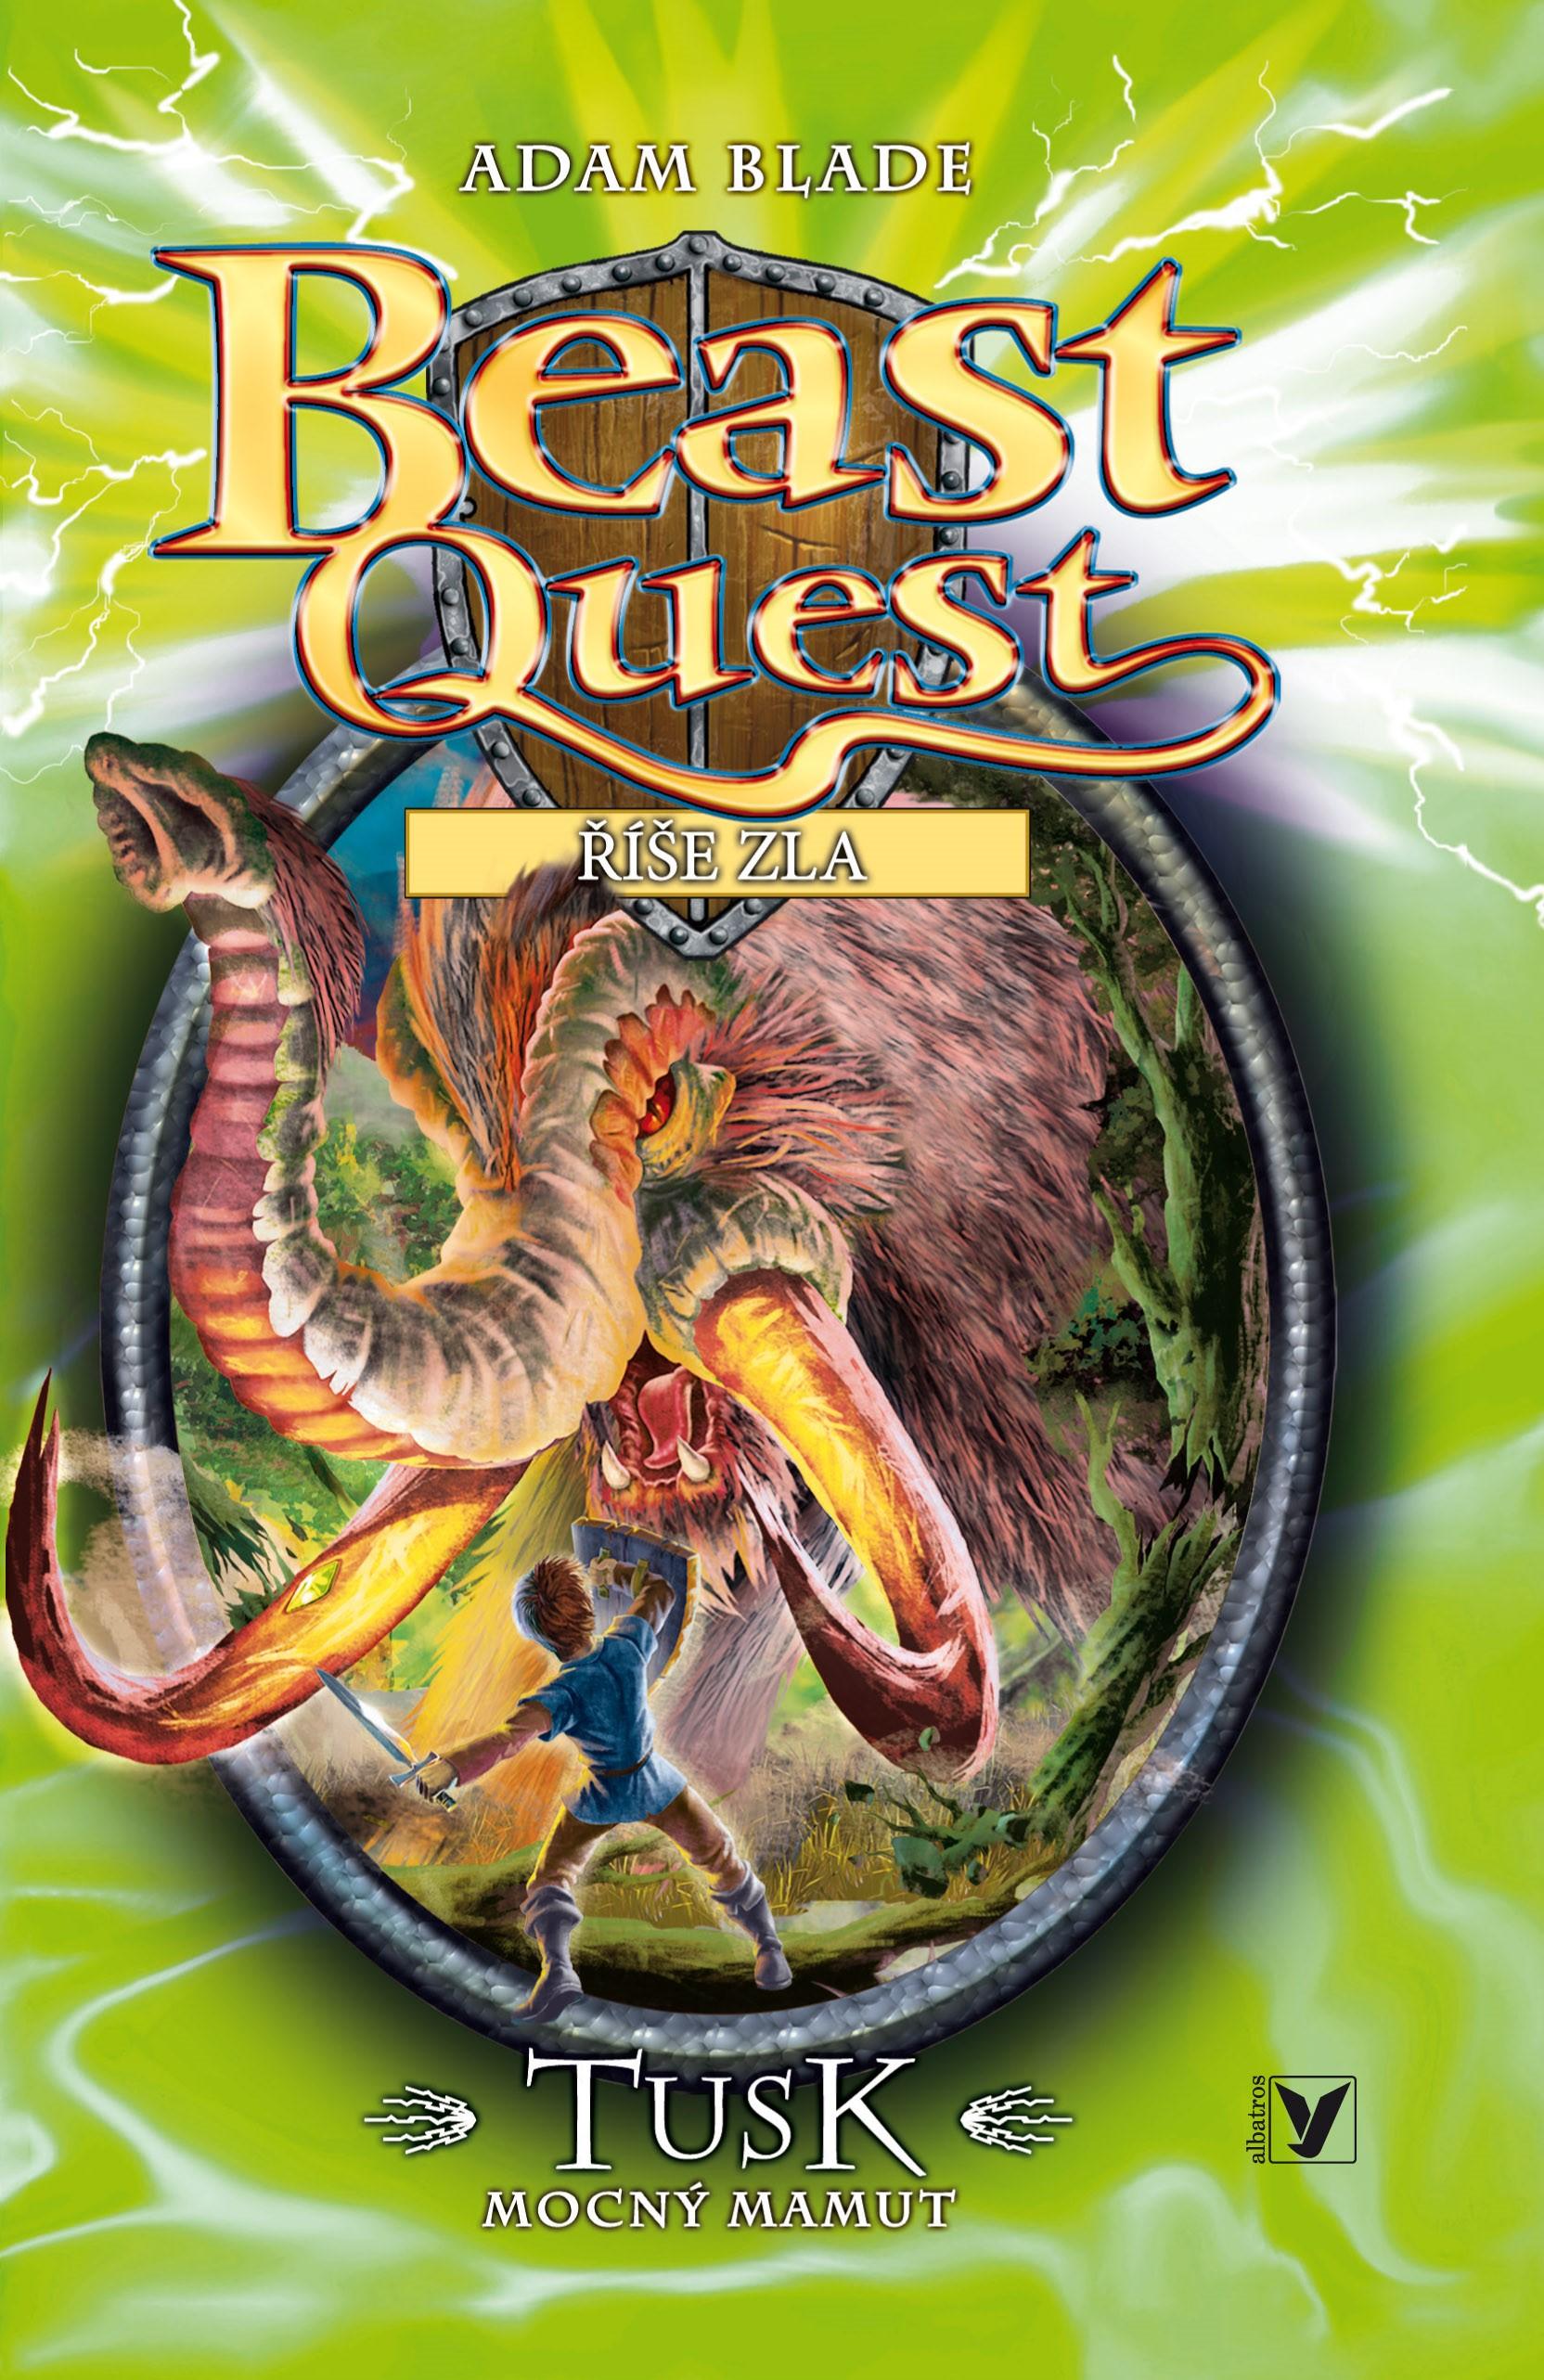 Tusk, mocný mamut - Beast Quest (17)